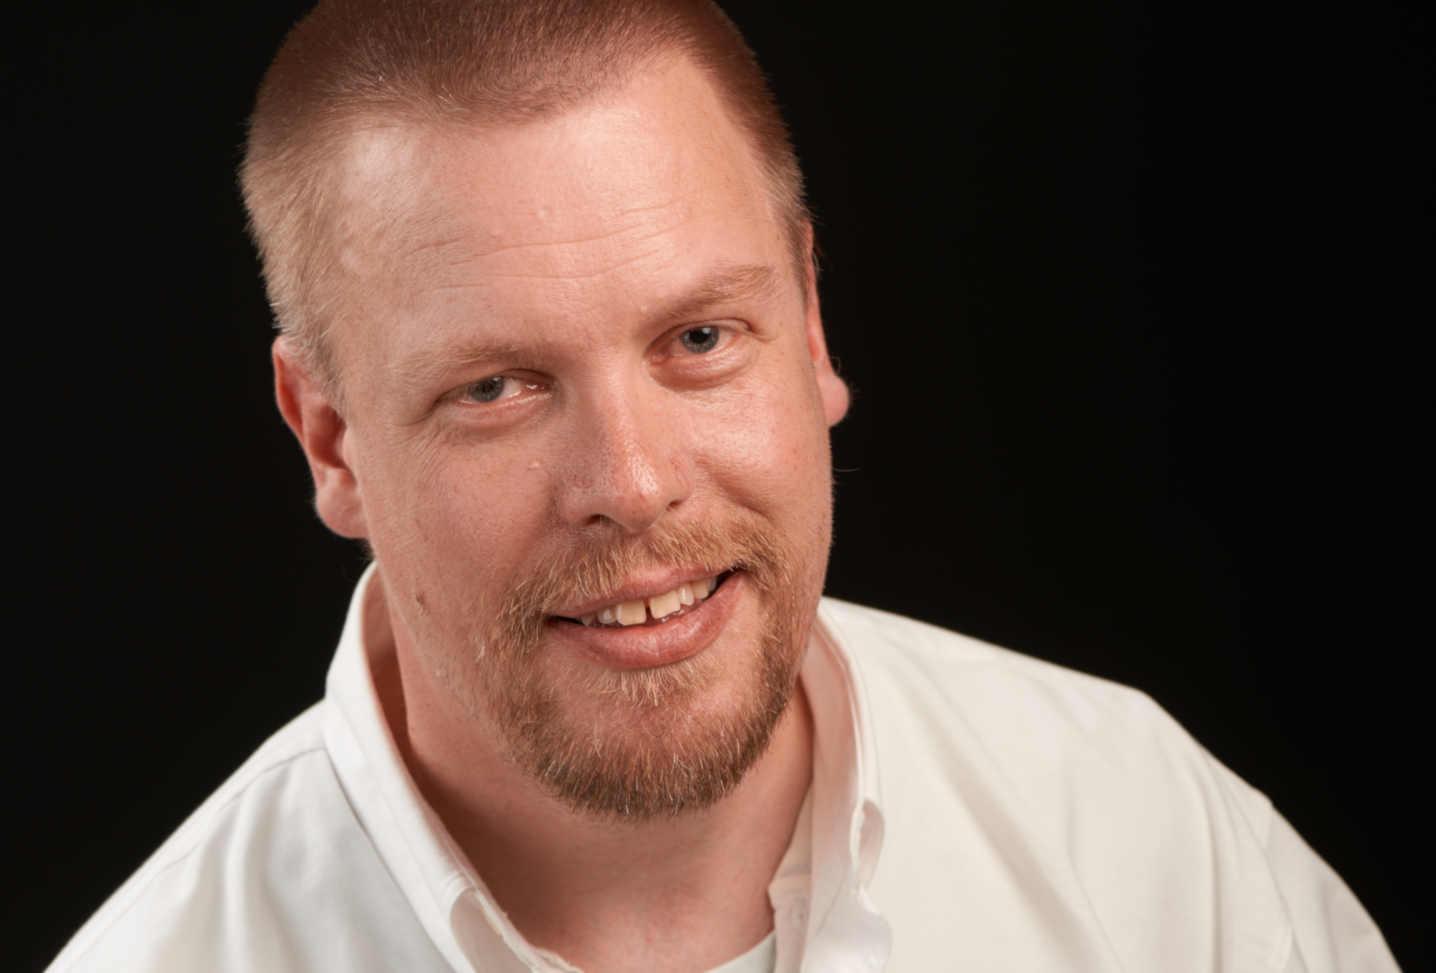 Claus Enghuus ejer af webbureauet Enghuus.Com